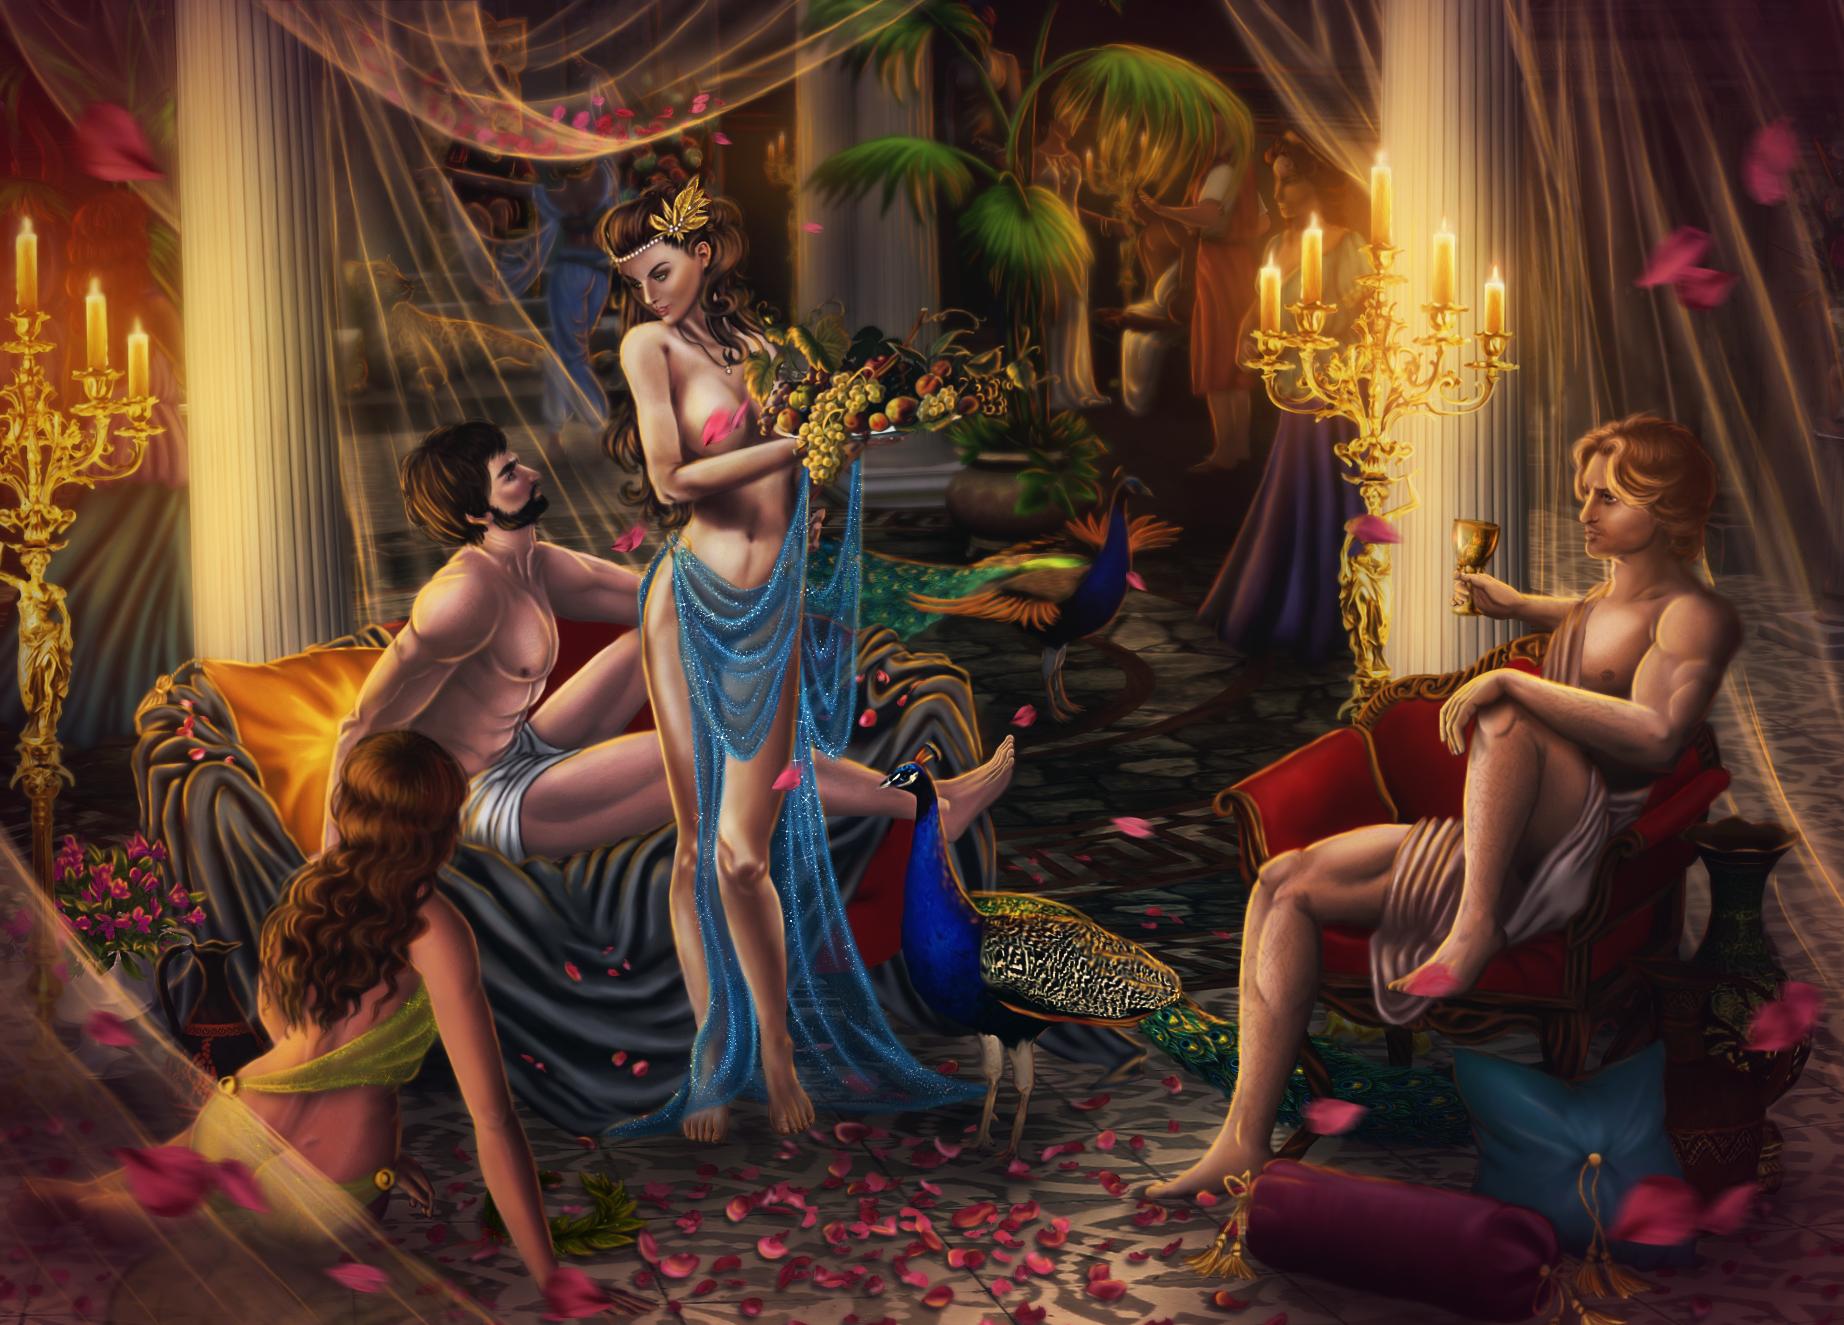 Palace_Intrigue (2).png